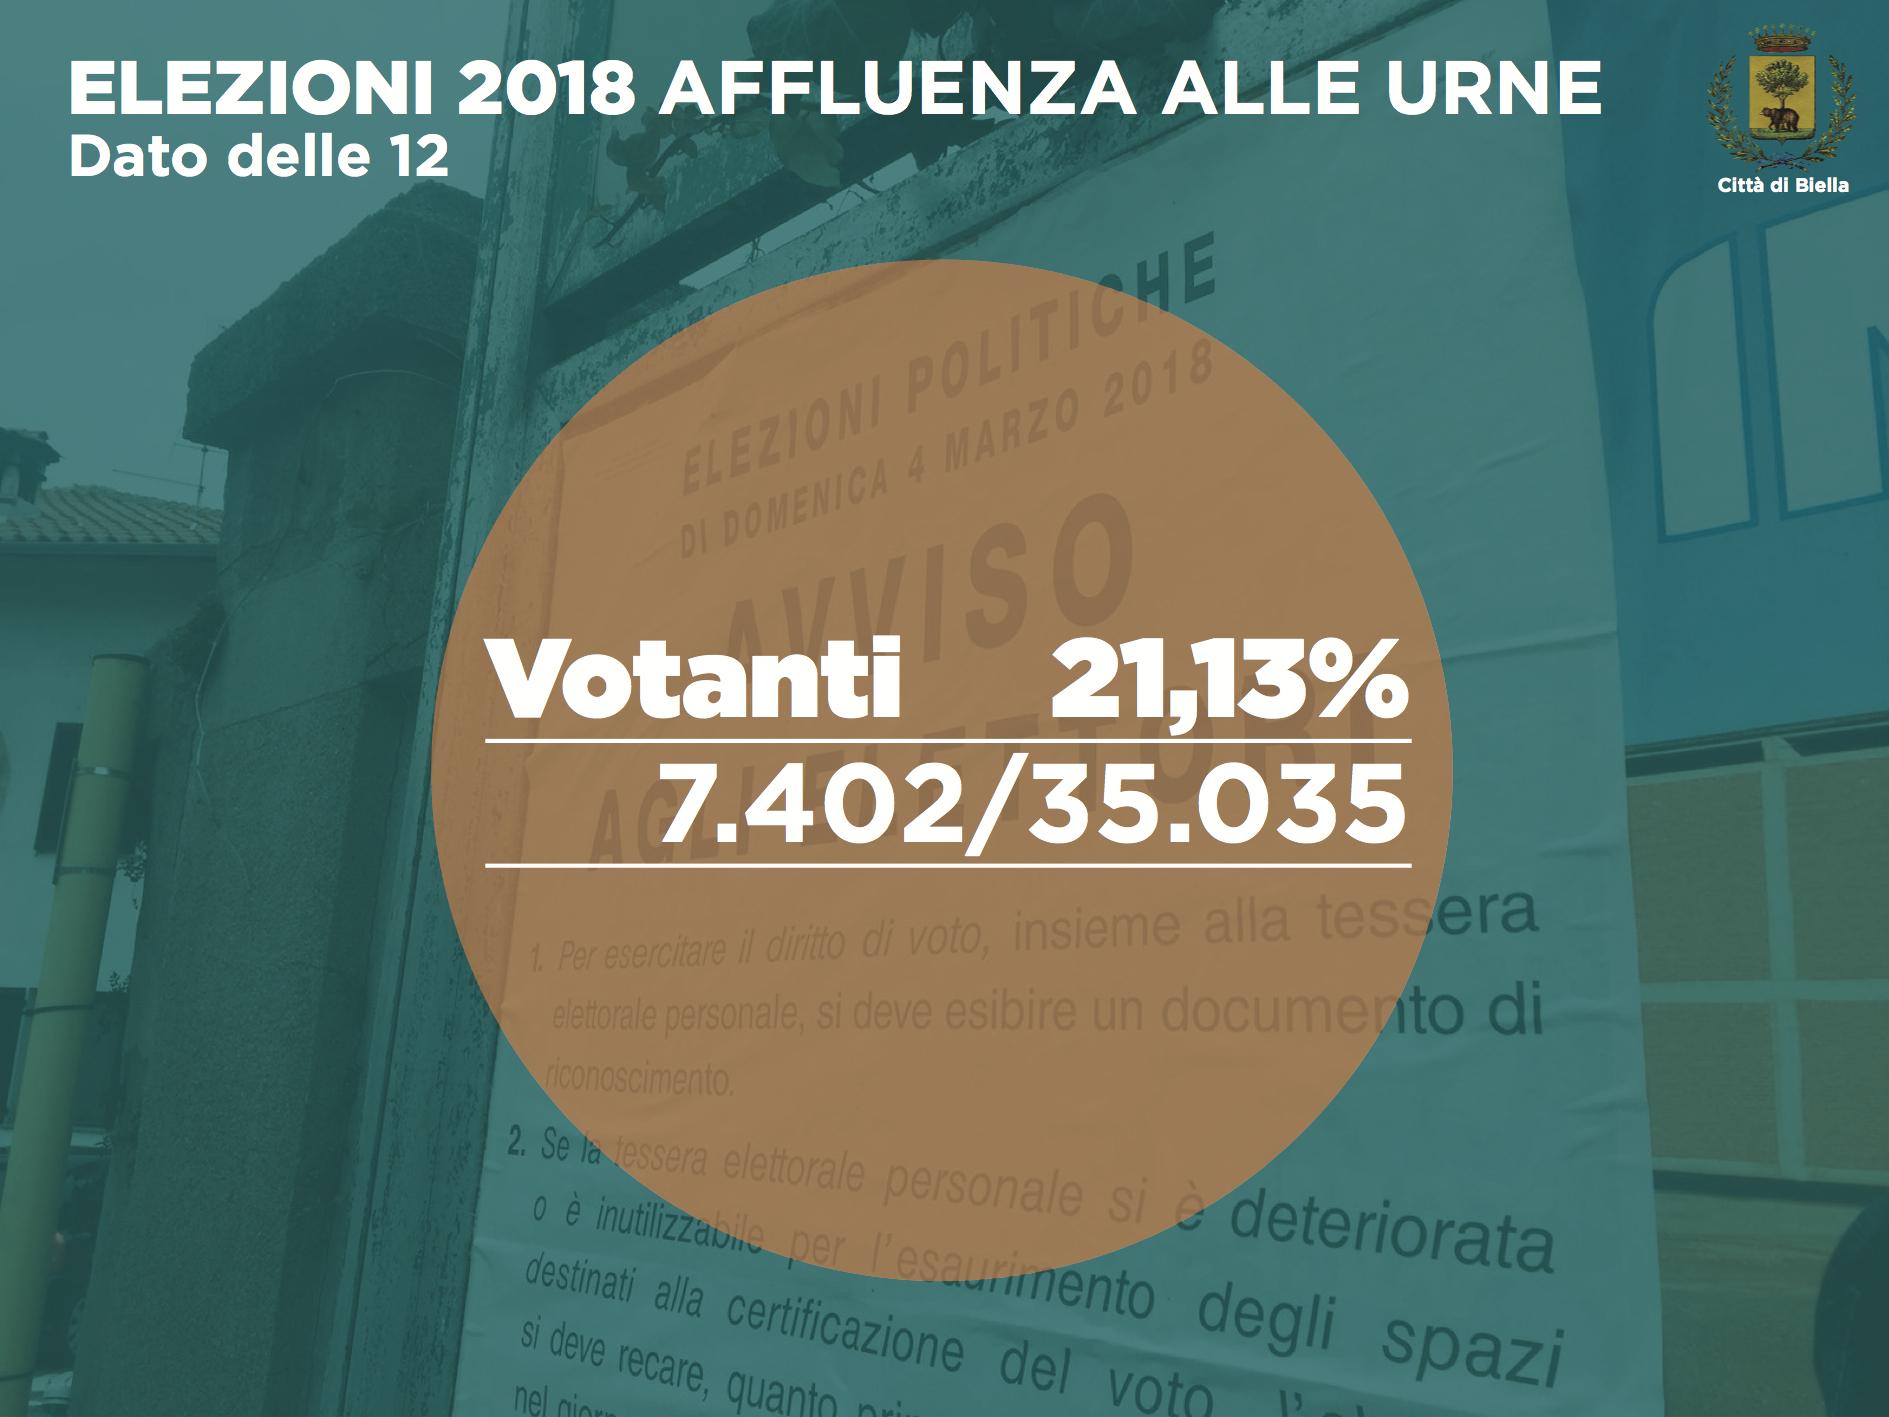 Elezioni 2018: l'affluenza alle 12